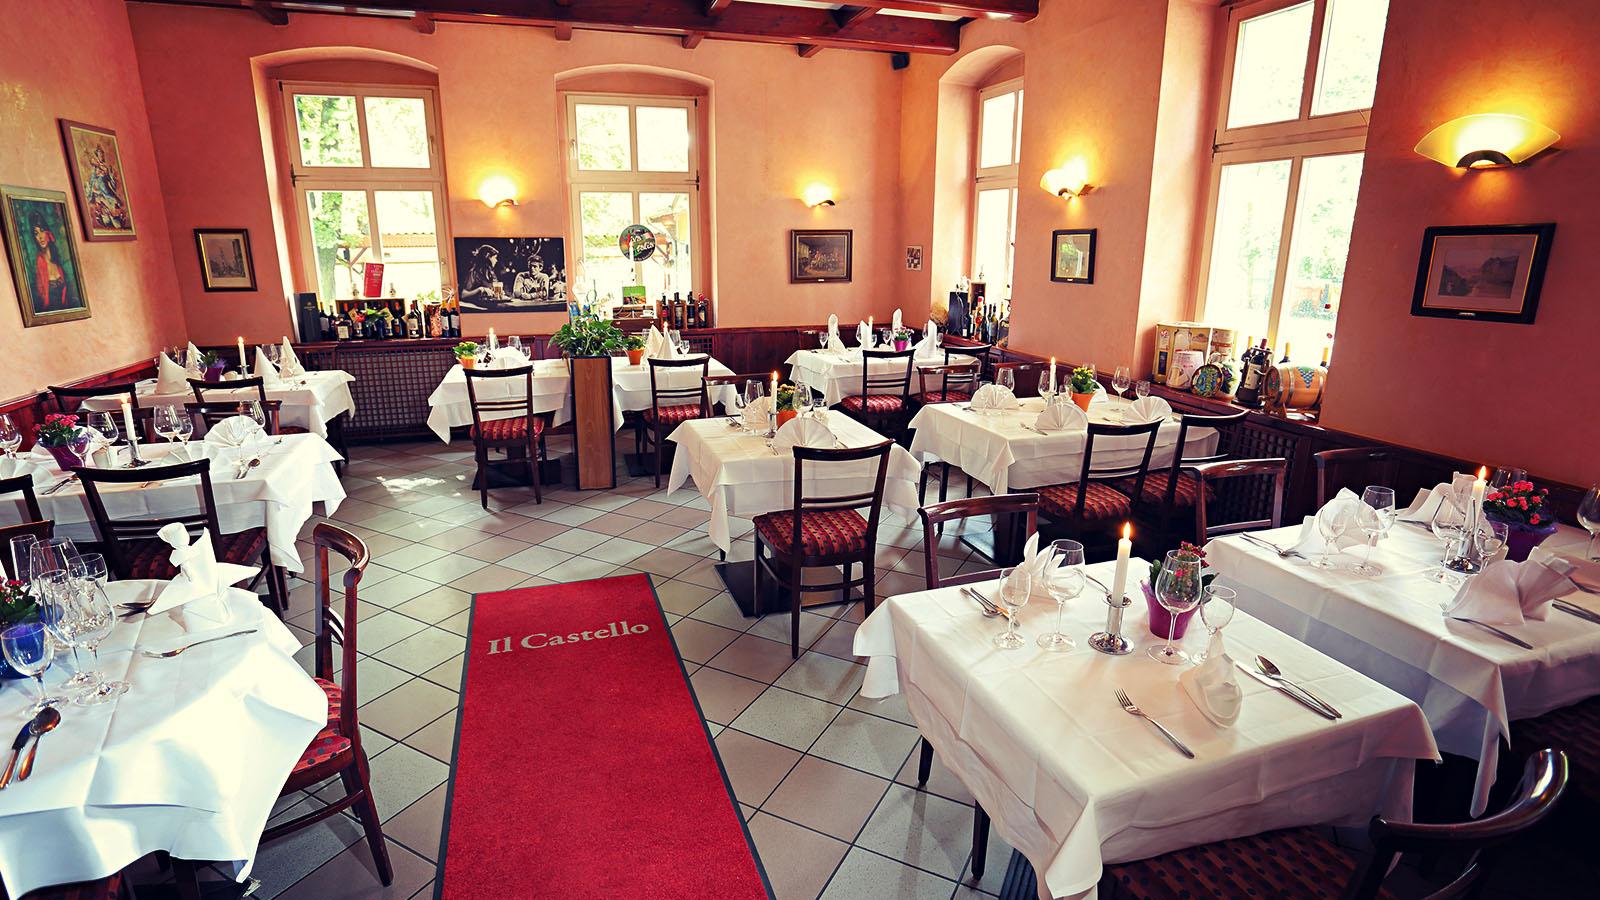 il-castello-berlin-buch-restaurant-eventlocation-pension-sllider3